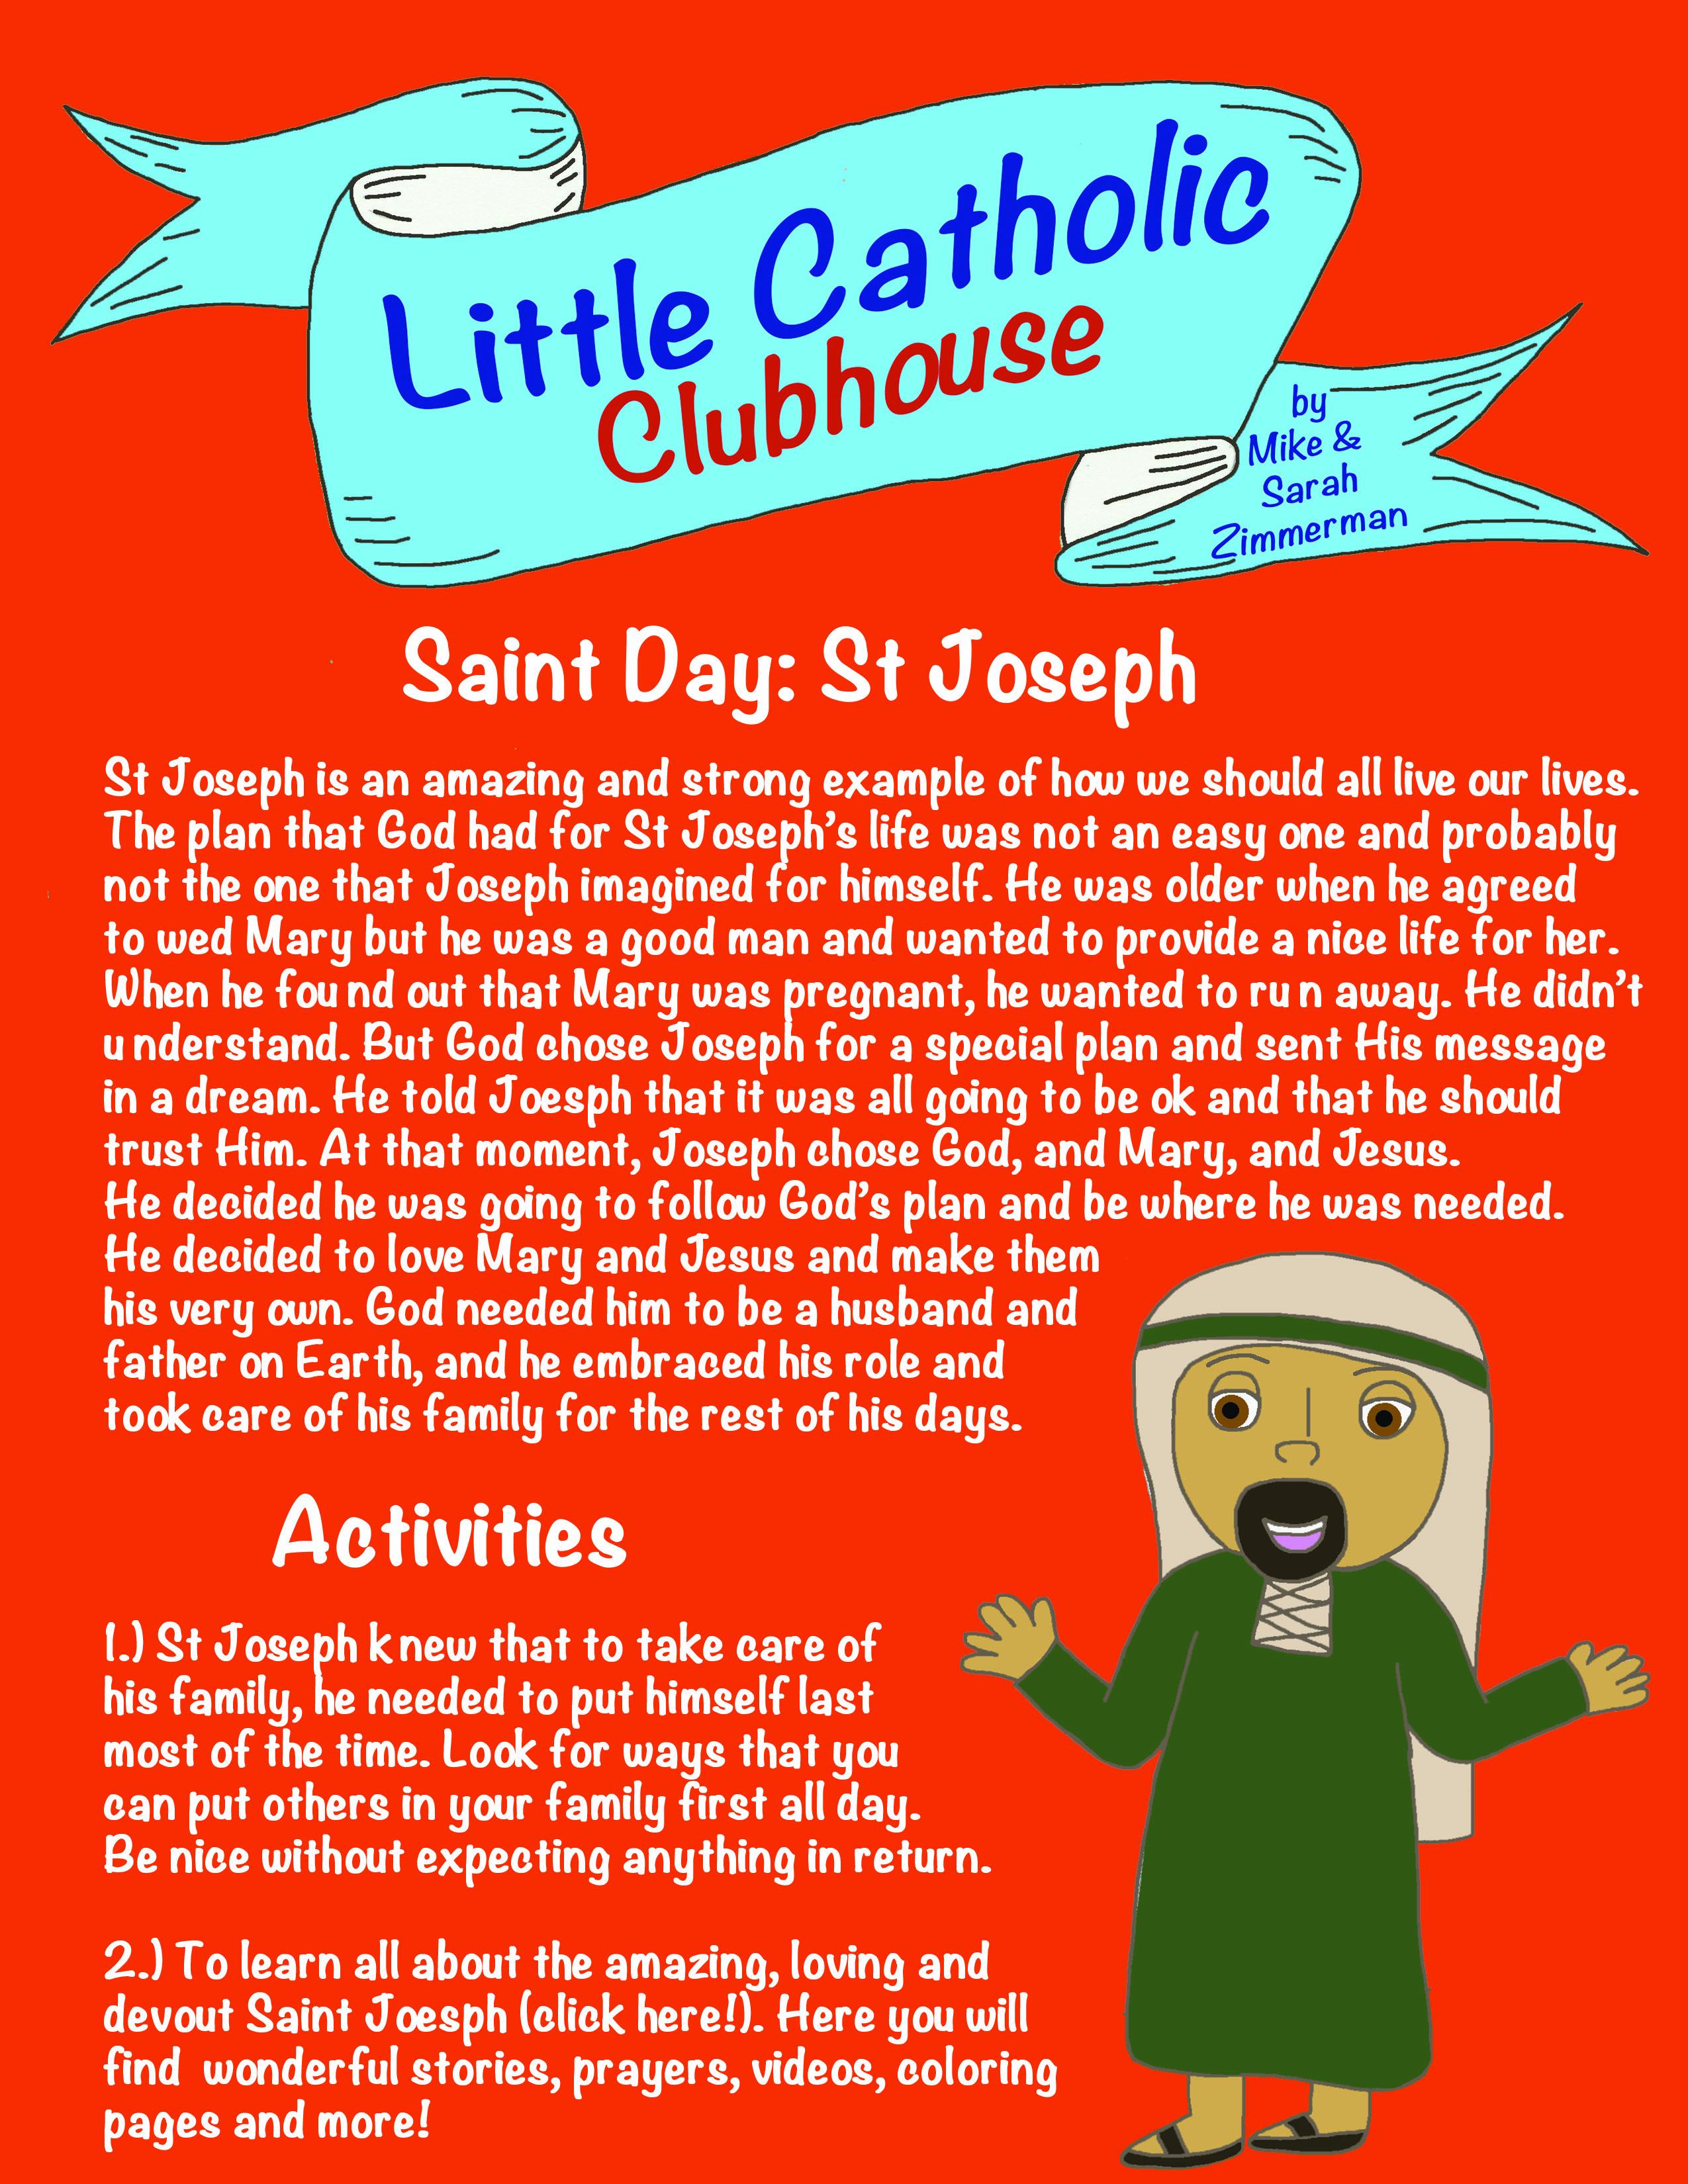 Day 21 Saint Day: St Joseph – Little Catholic Clubhouse